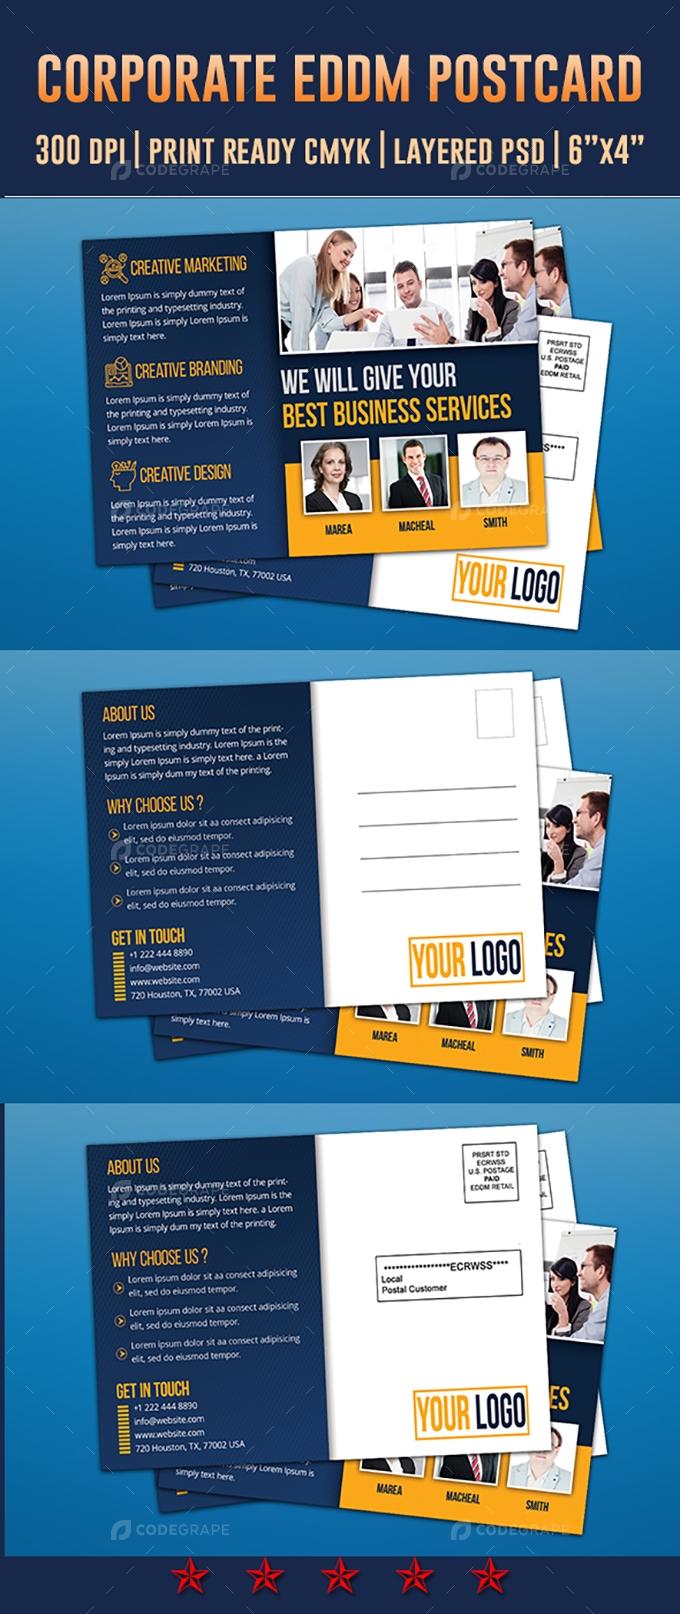 Corporate Postcard & Direct Mail EDDM Postcard Design